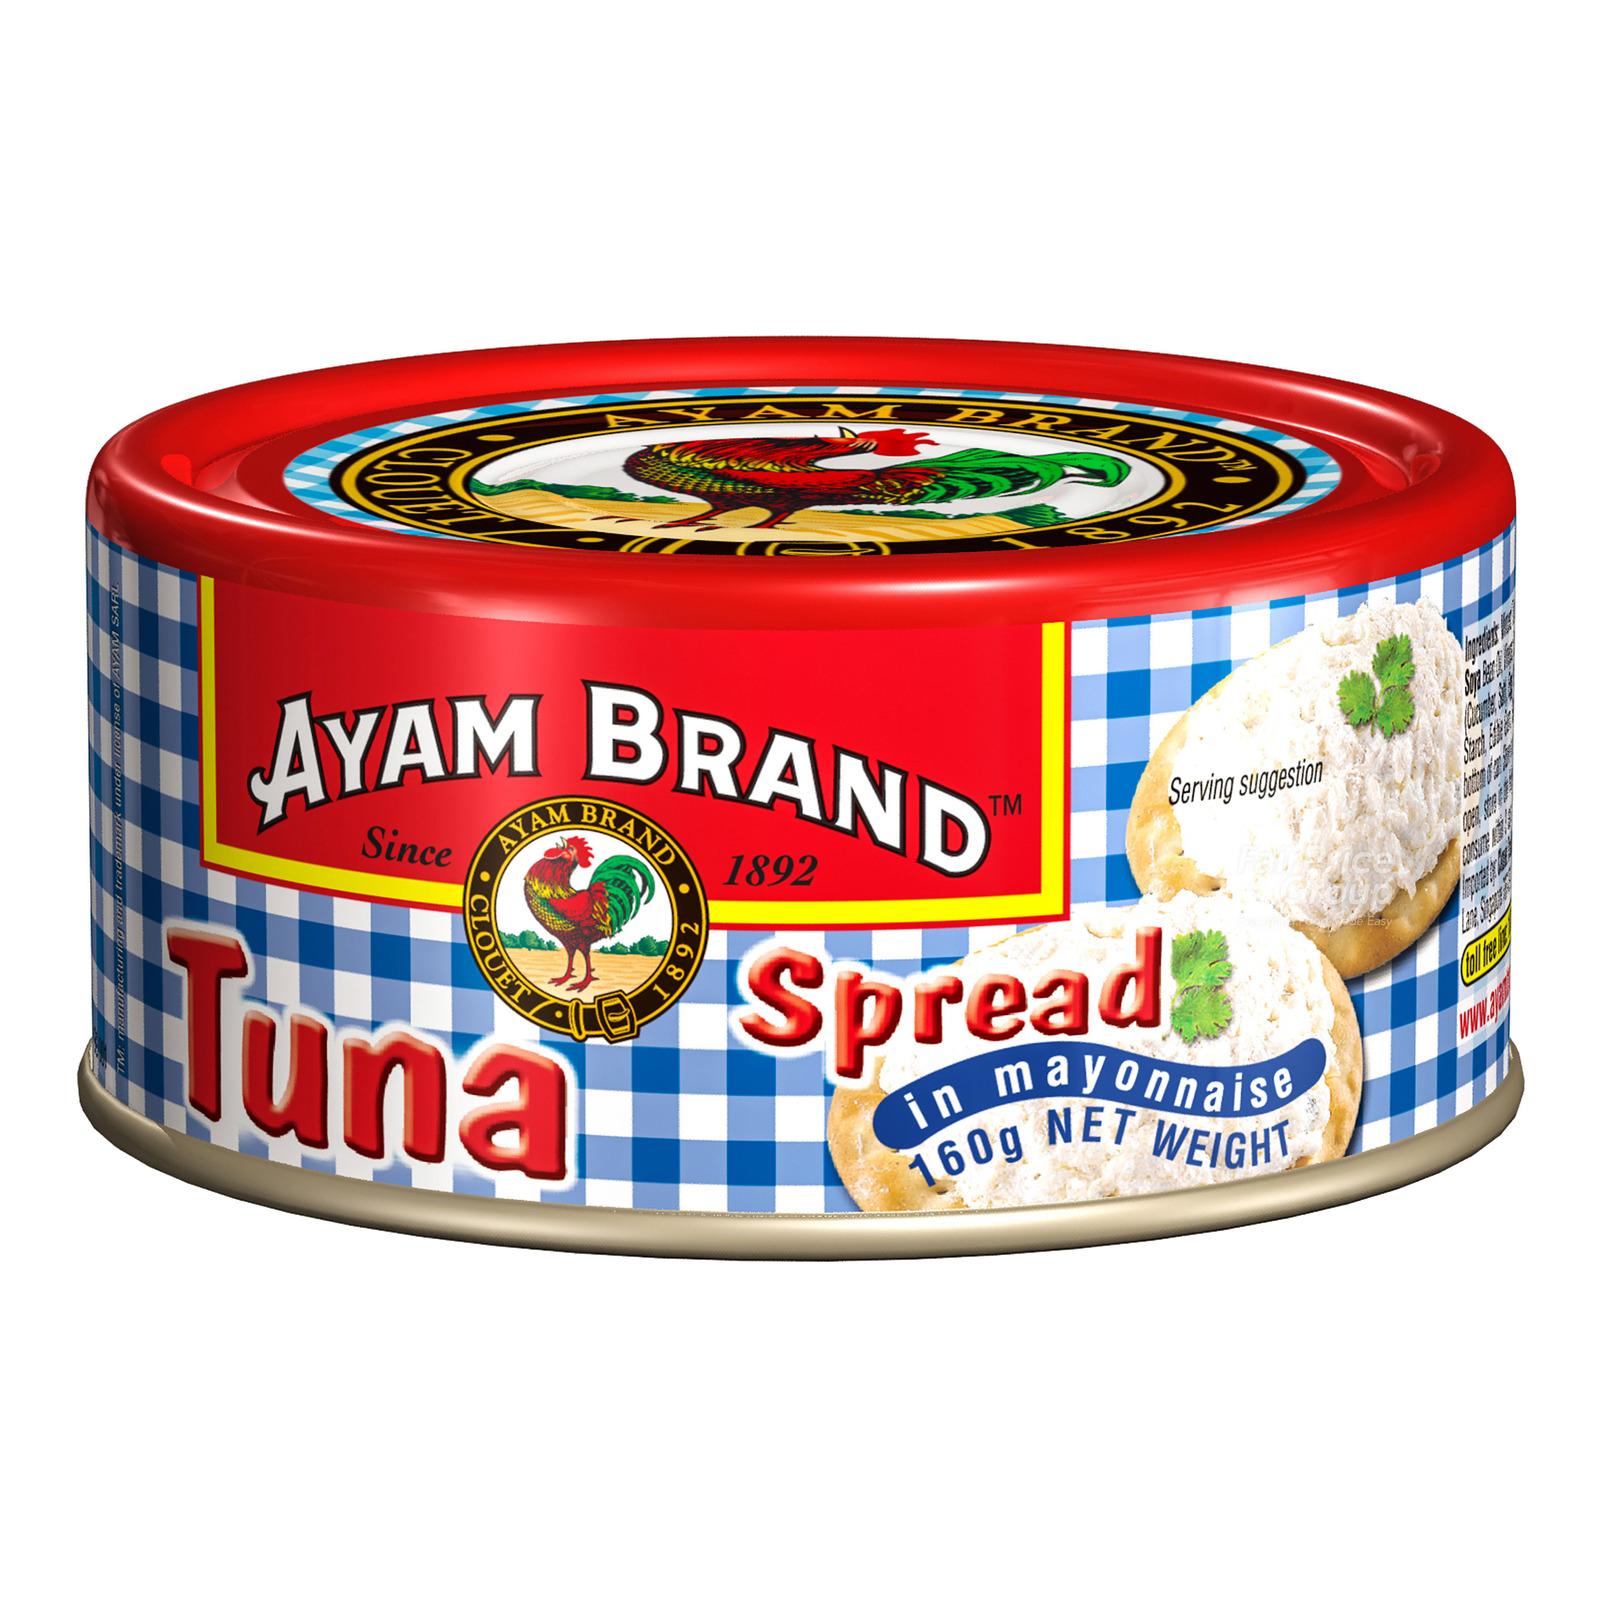 Ayam Brand Spread in Mayonnaise - Tuna